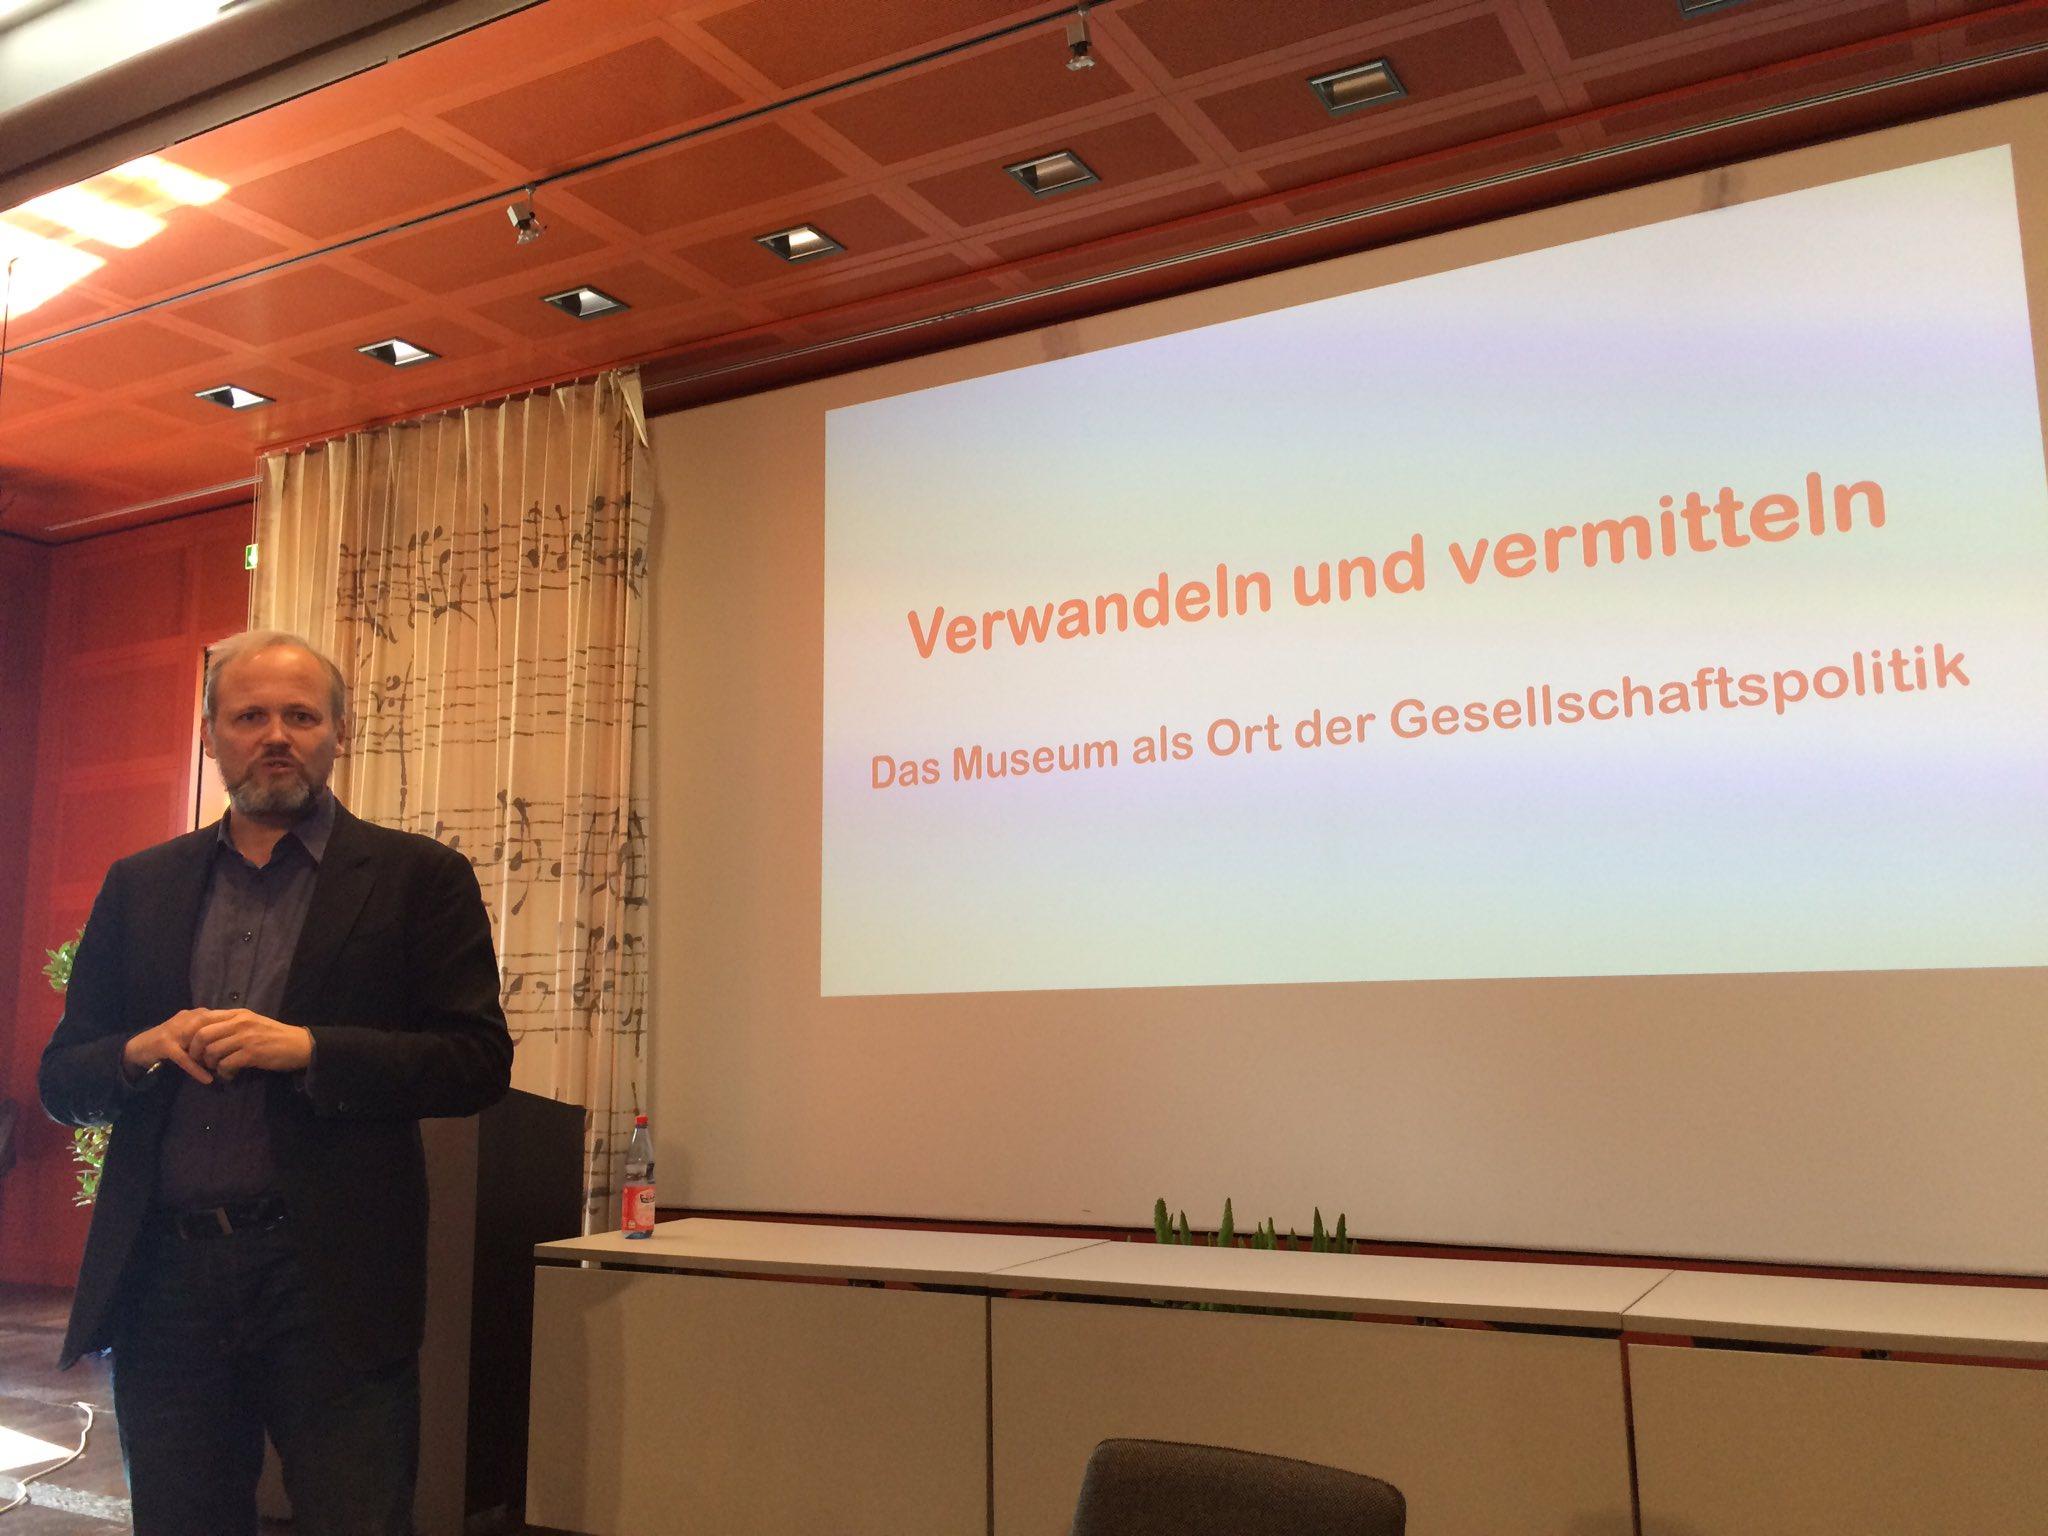 Heute zu Gast #DDSS16: Wolfgang Ullrich @ideenfreiheit Museum als Ort der Gesellschaftspolitik?! https://t.co/ufb05yMuzZ